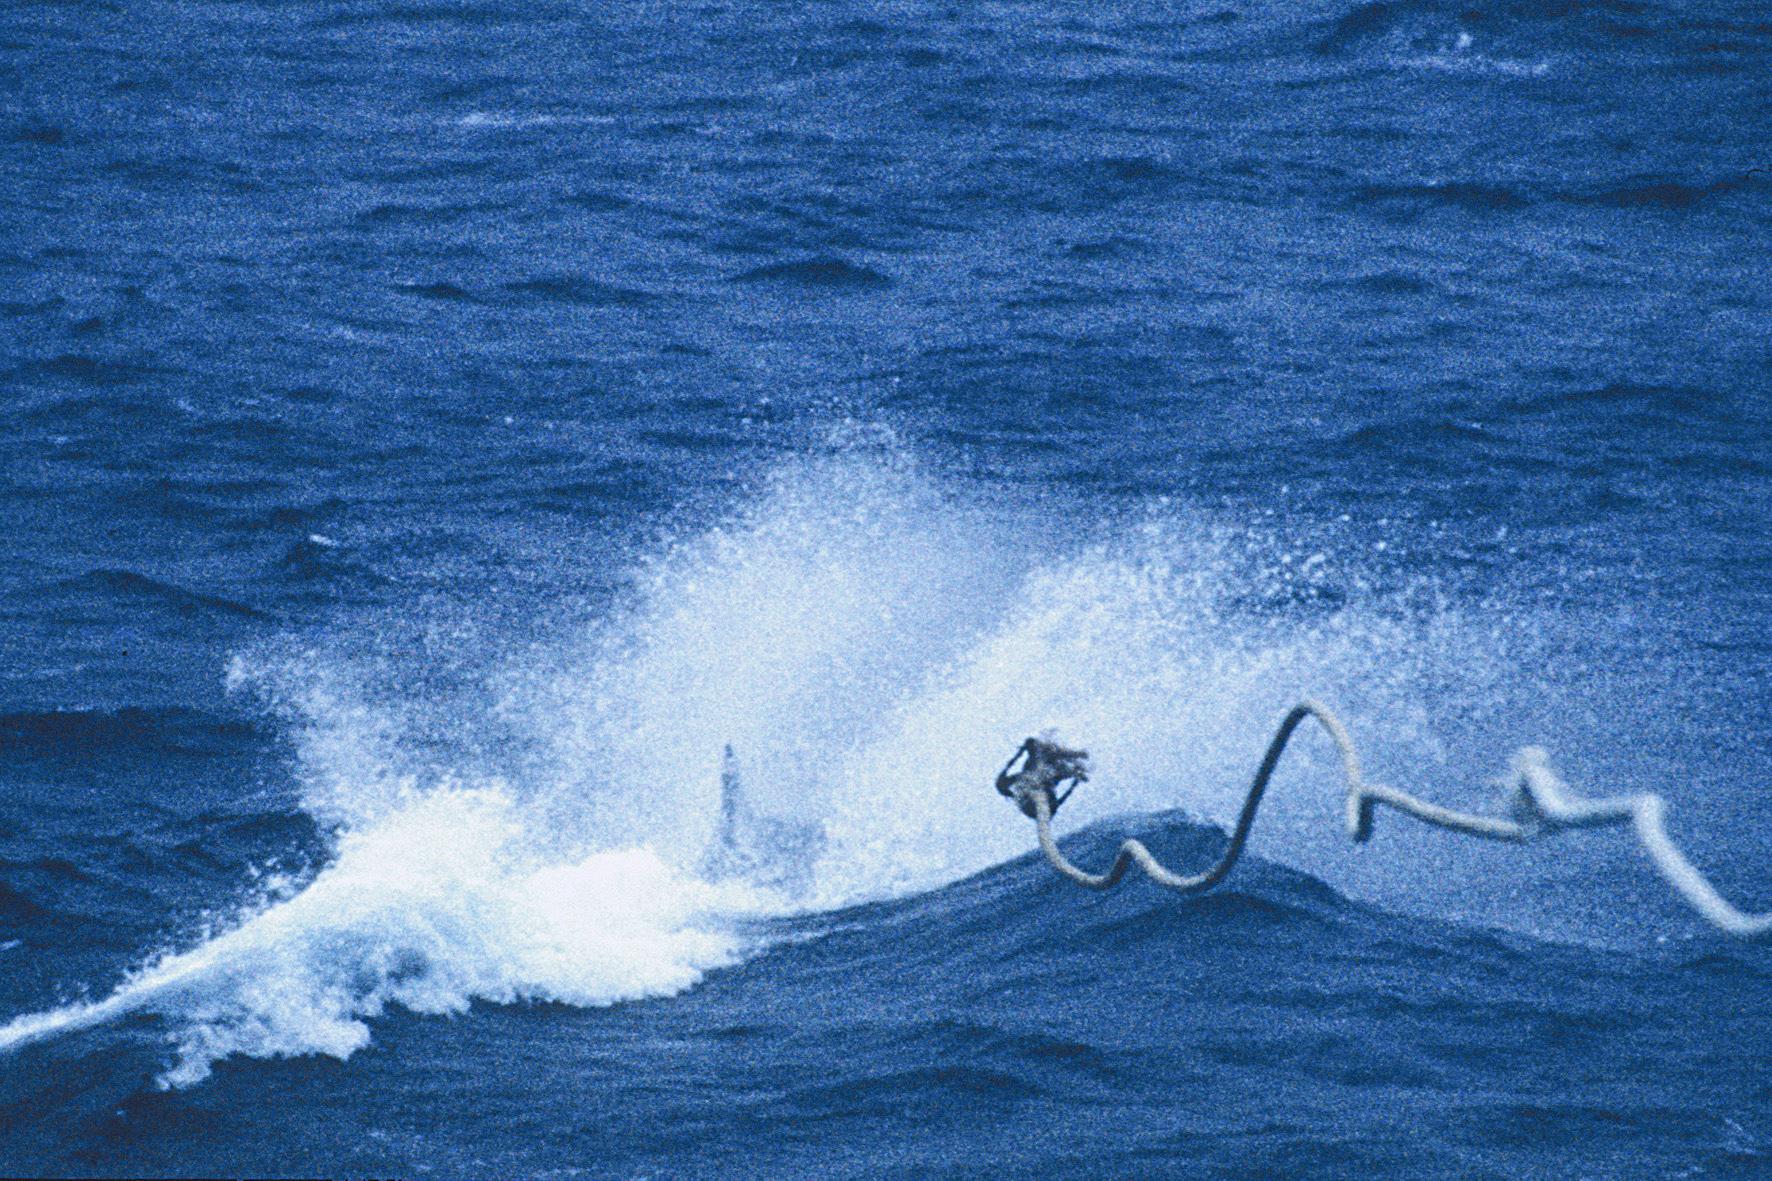 Japan hebelt am Walfangmoratorium